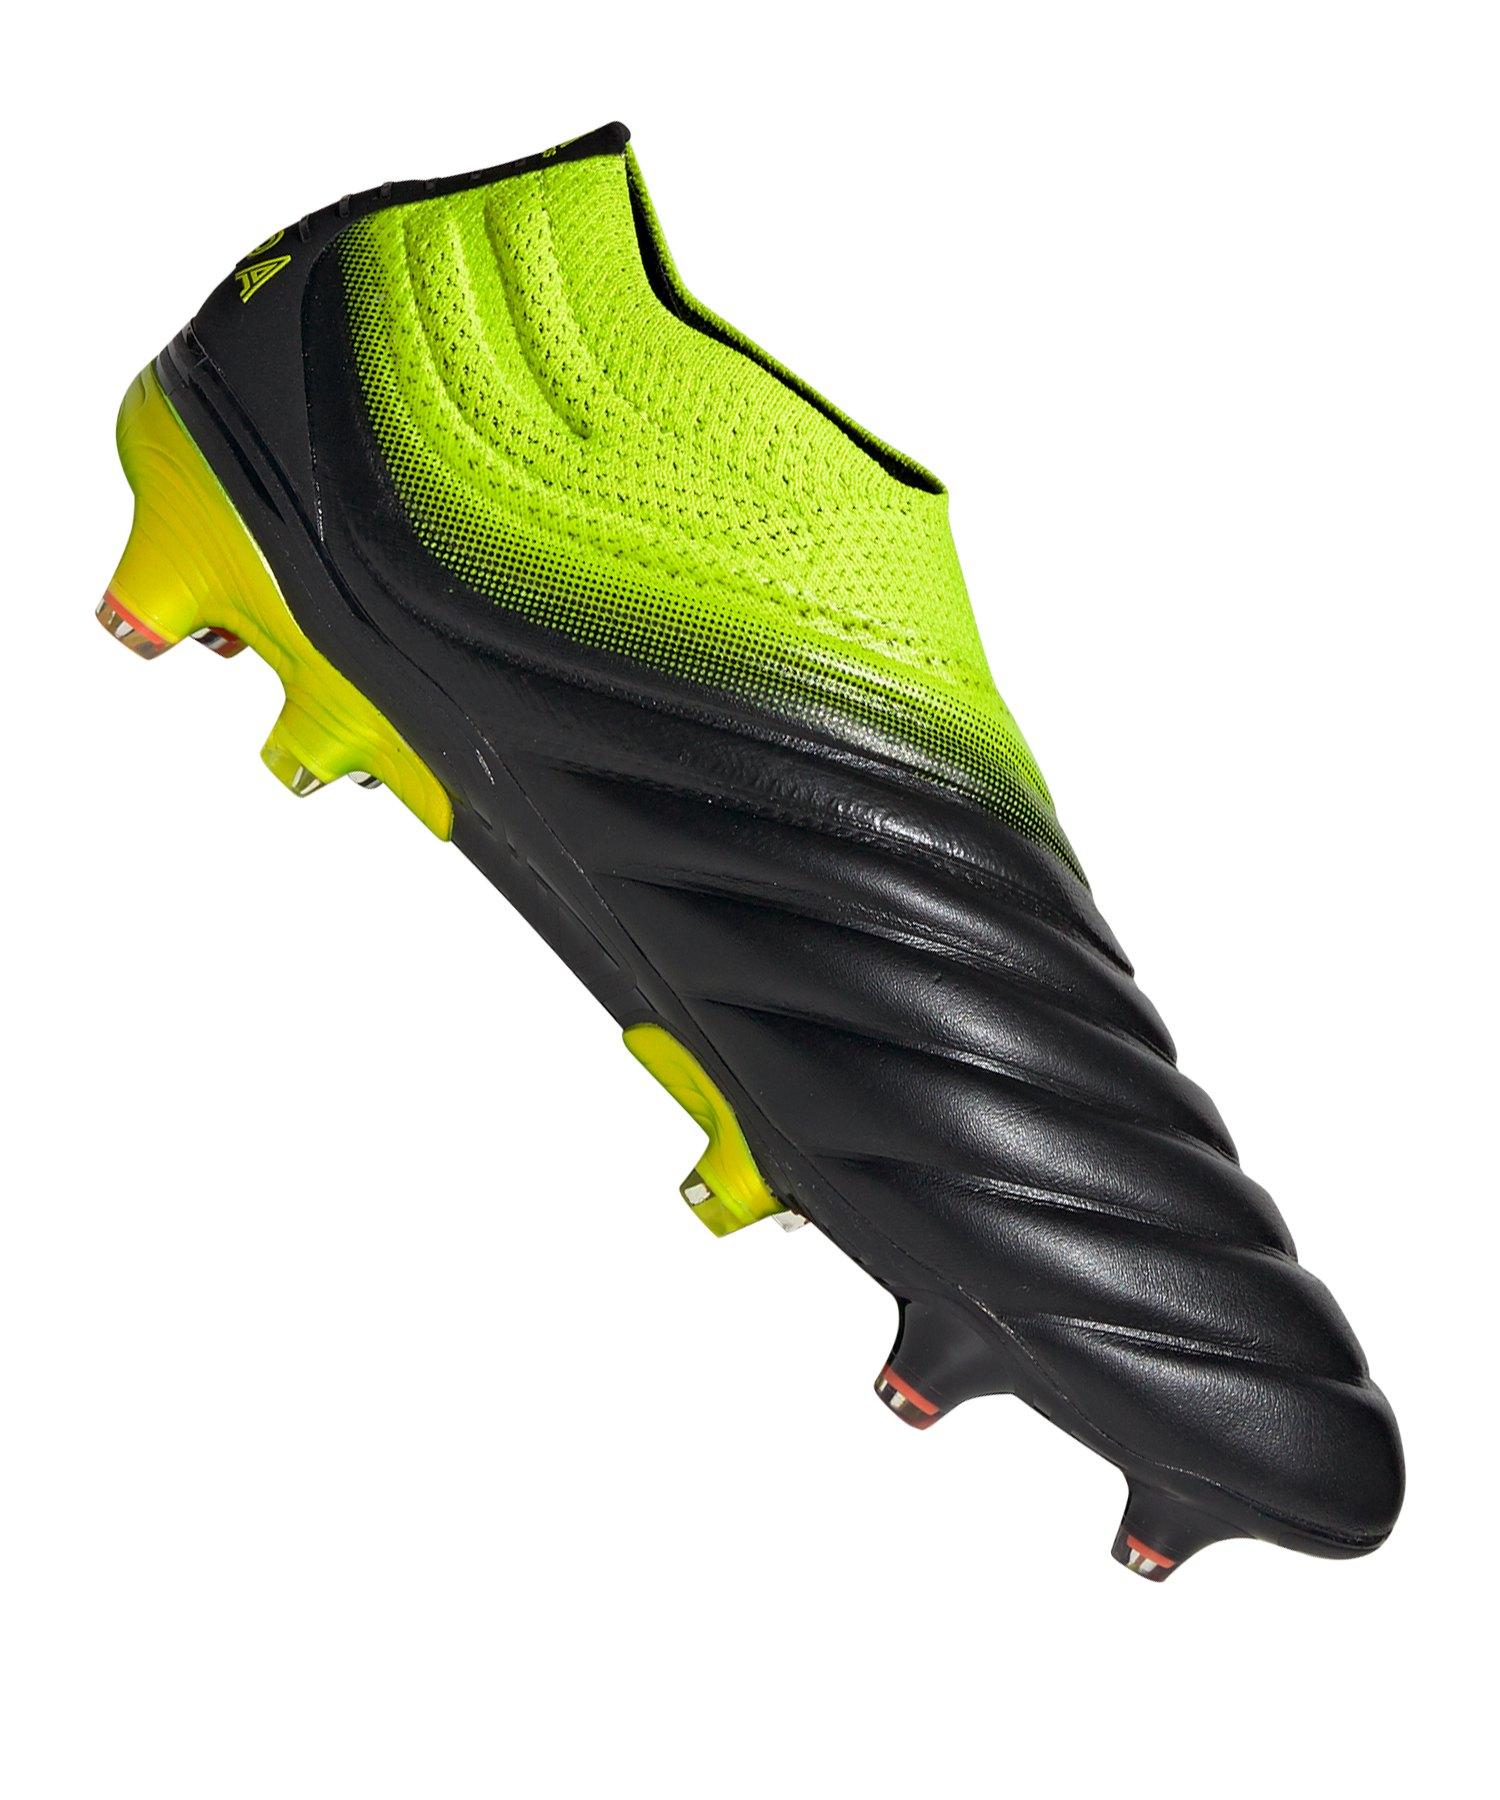 adidas COPA 19+ FG Schwarz Gelb - schwarz